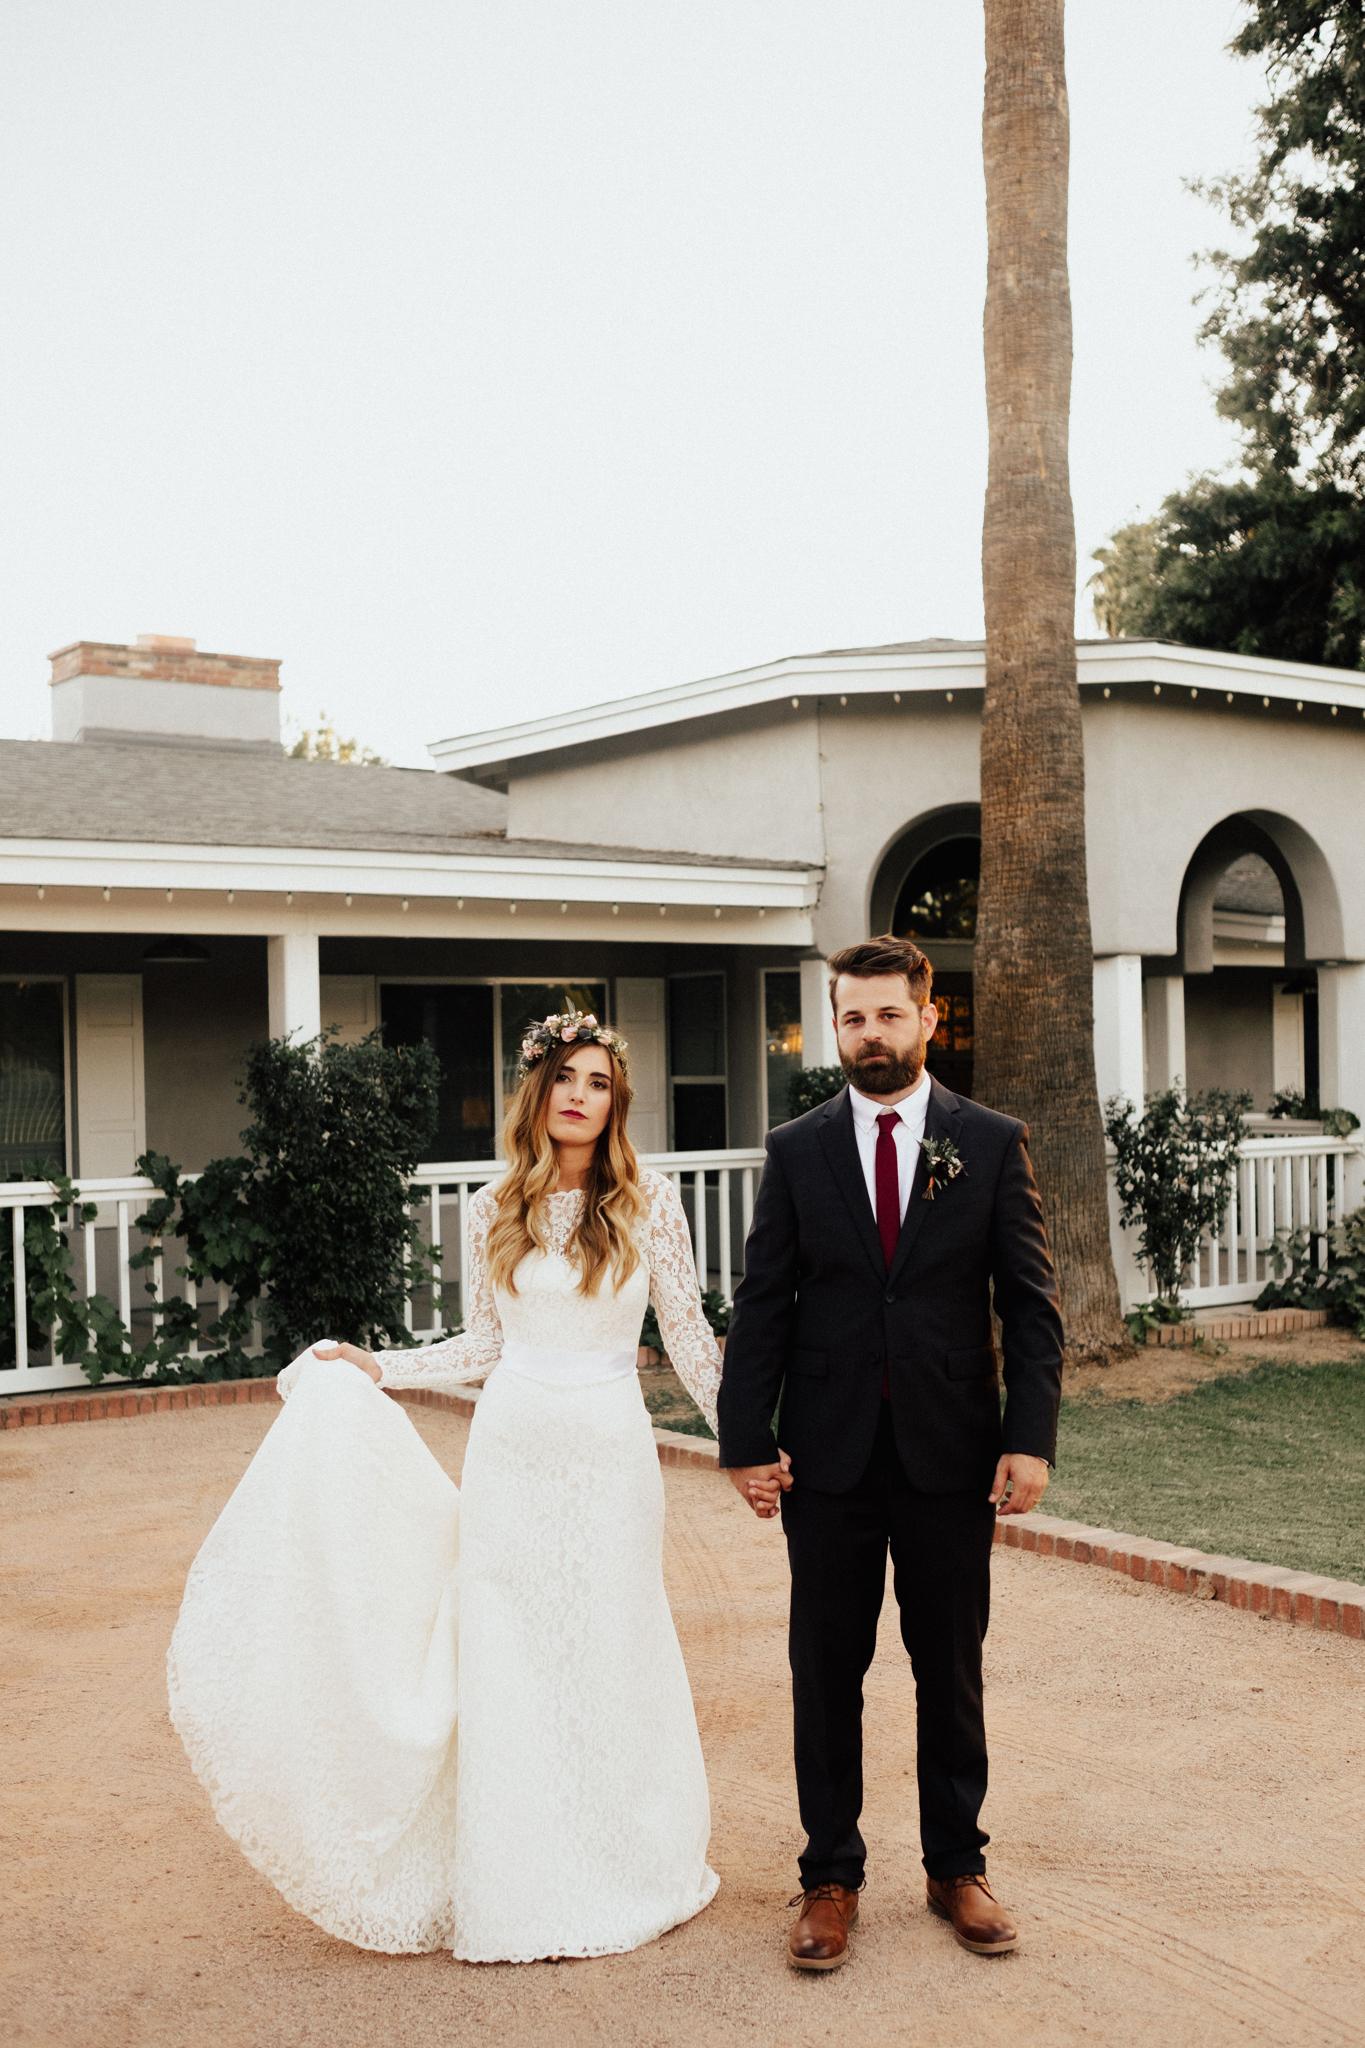 Arizona-Adventure-Elopement-Wedding-Photographer-181.jpg